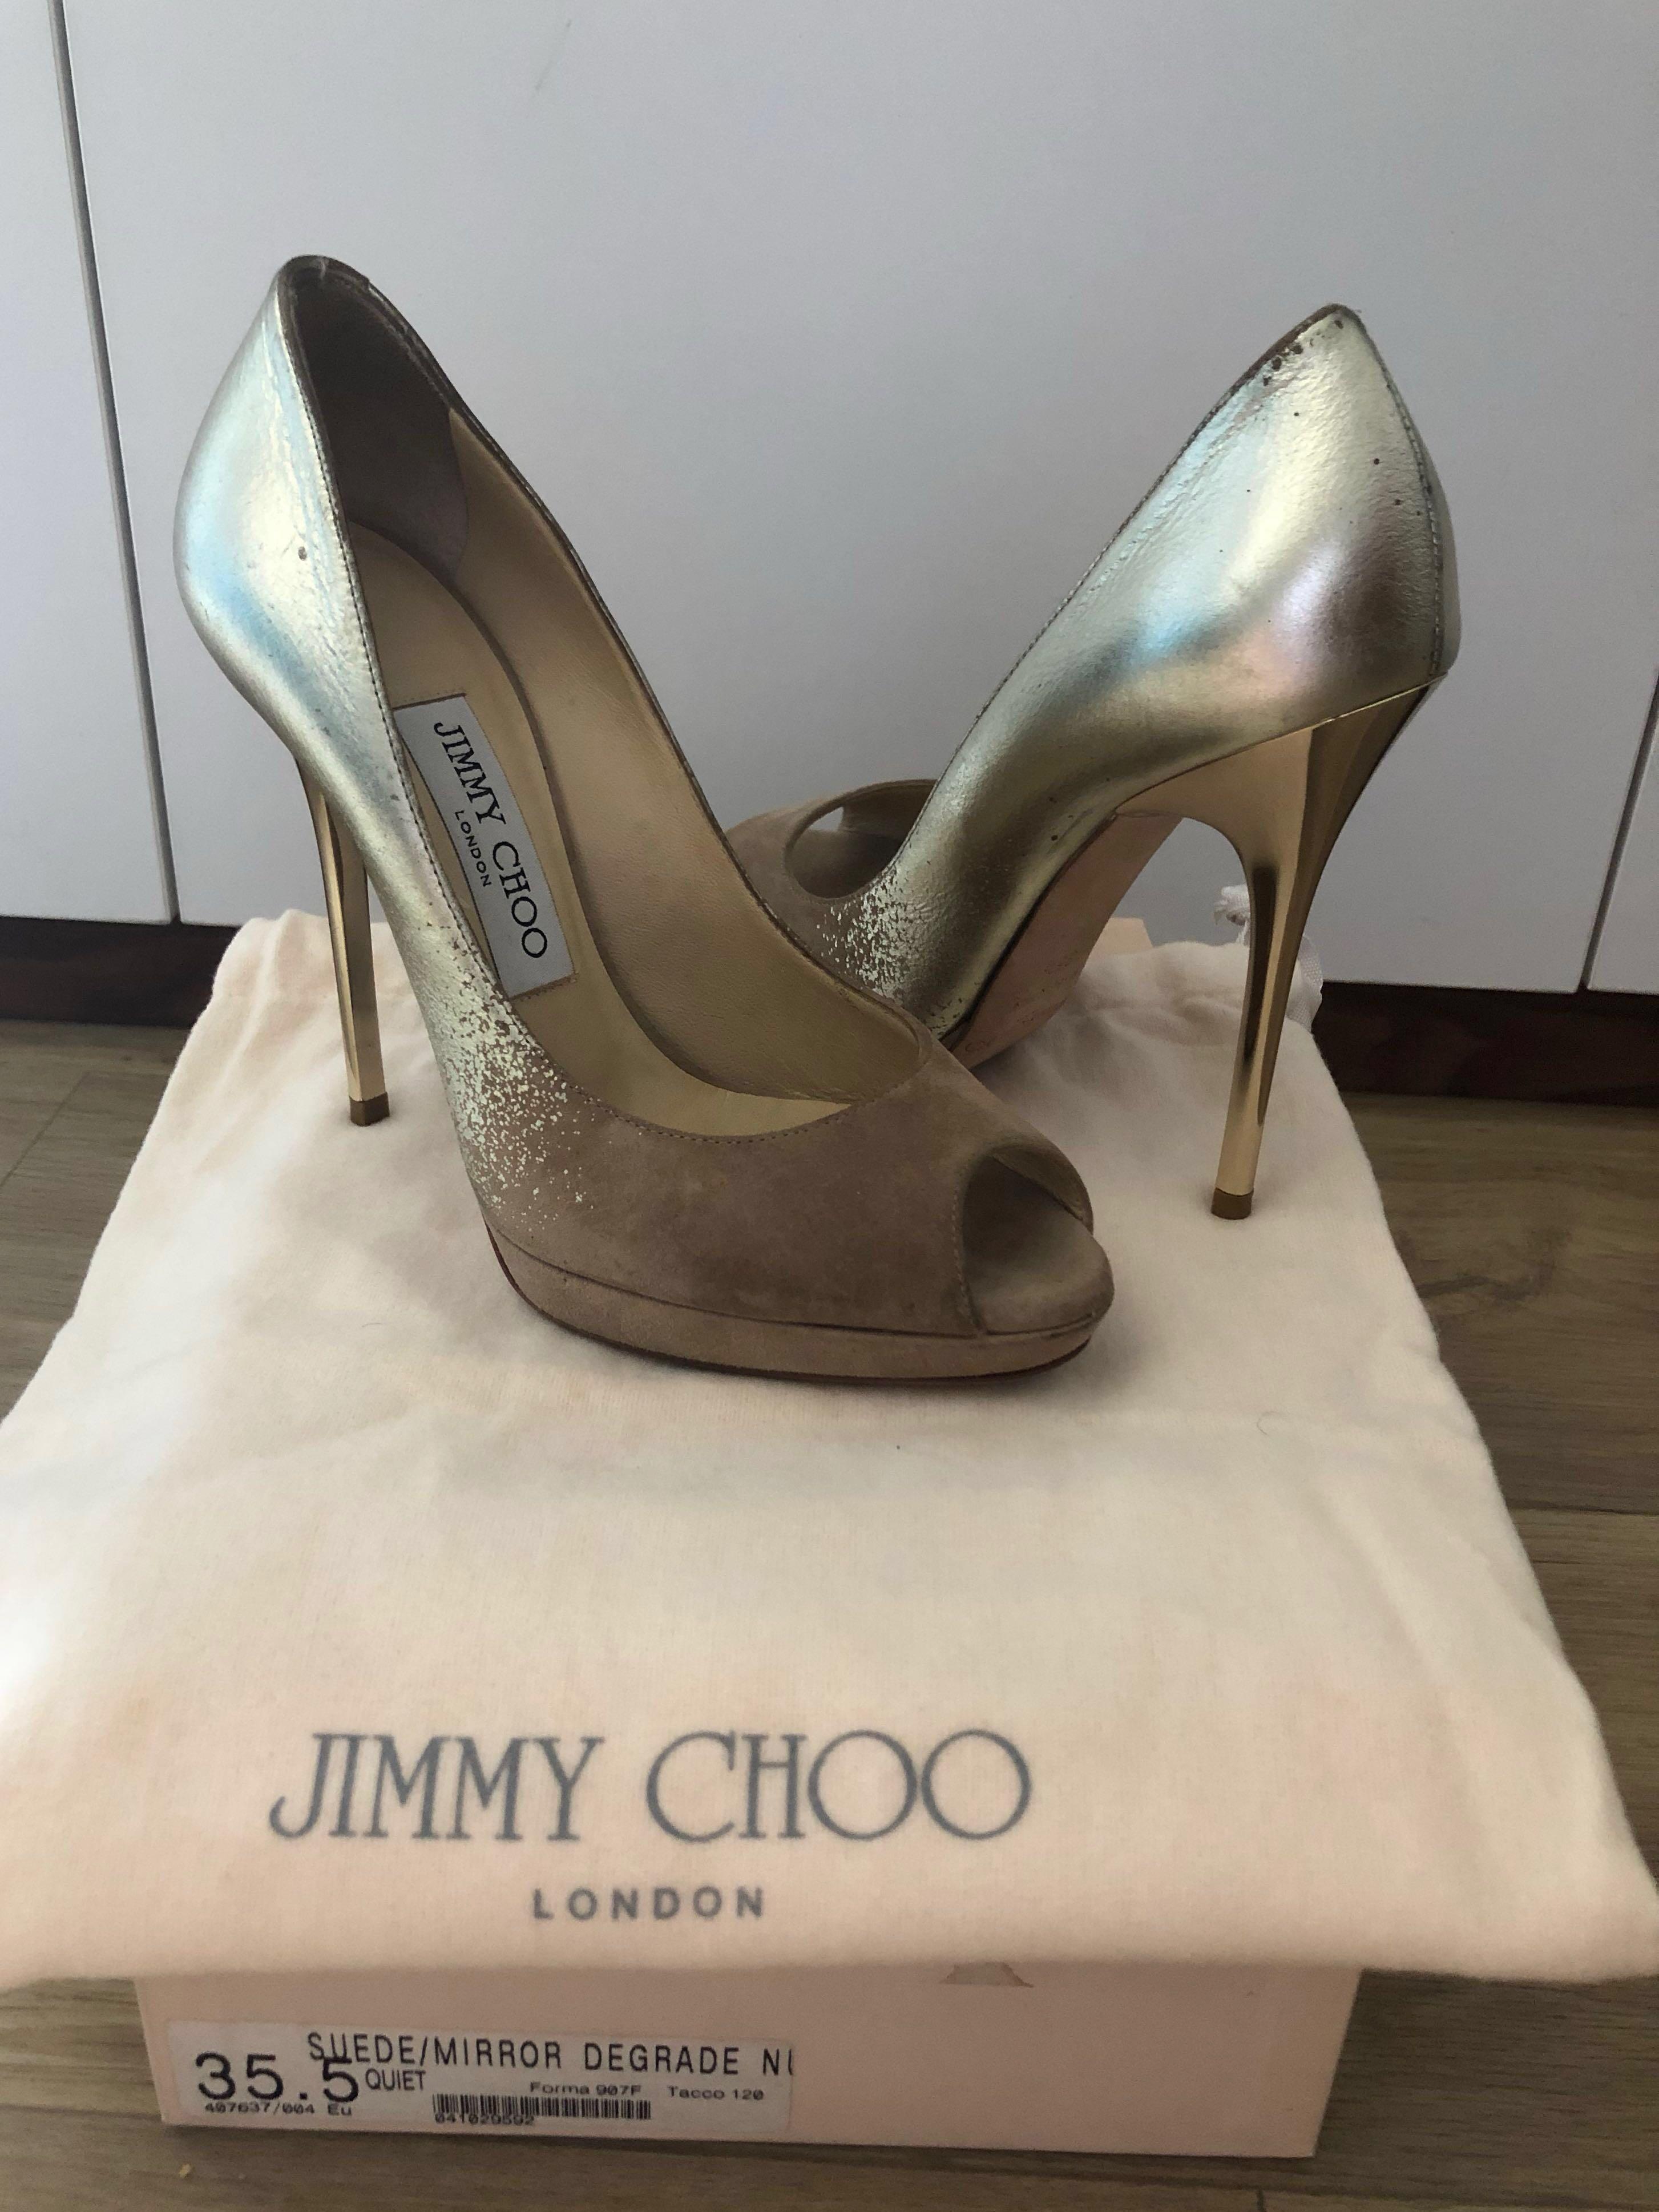 Authentic Jimmy Choo's vintage, Women's